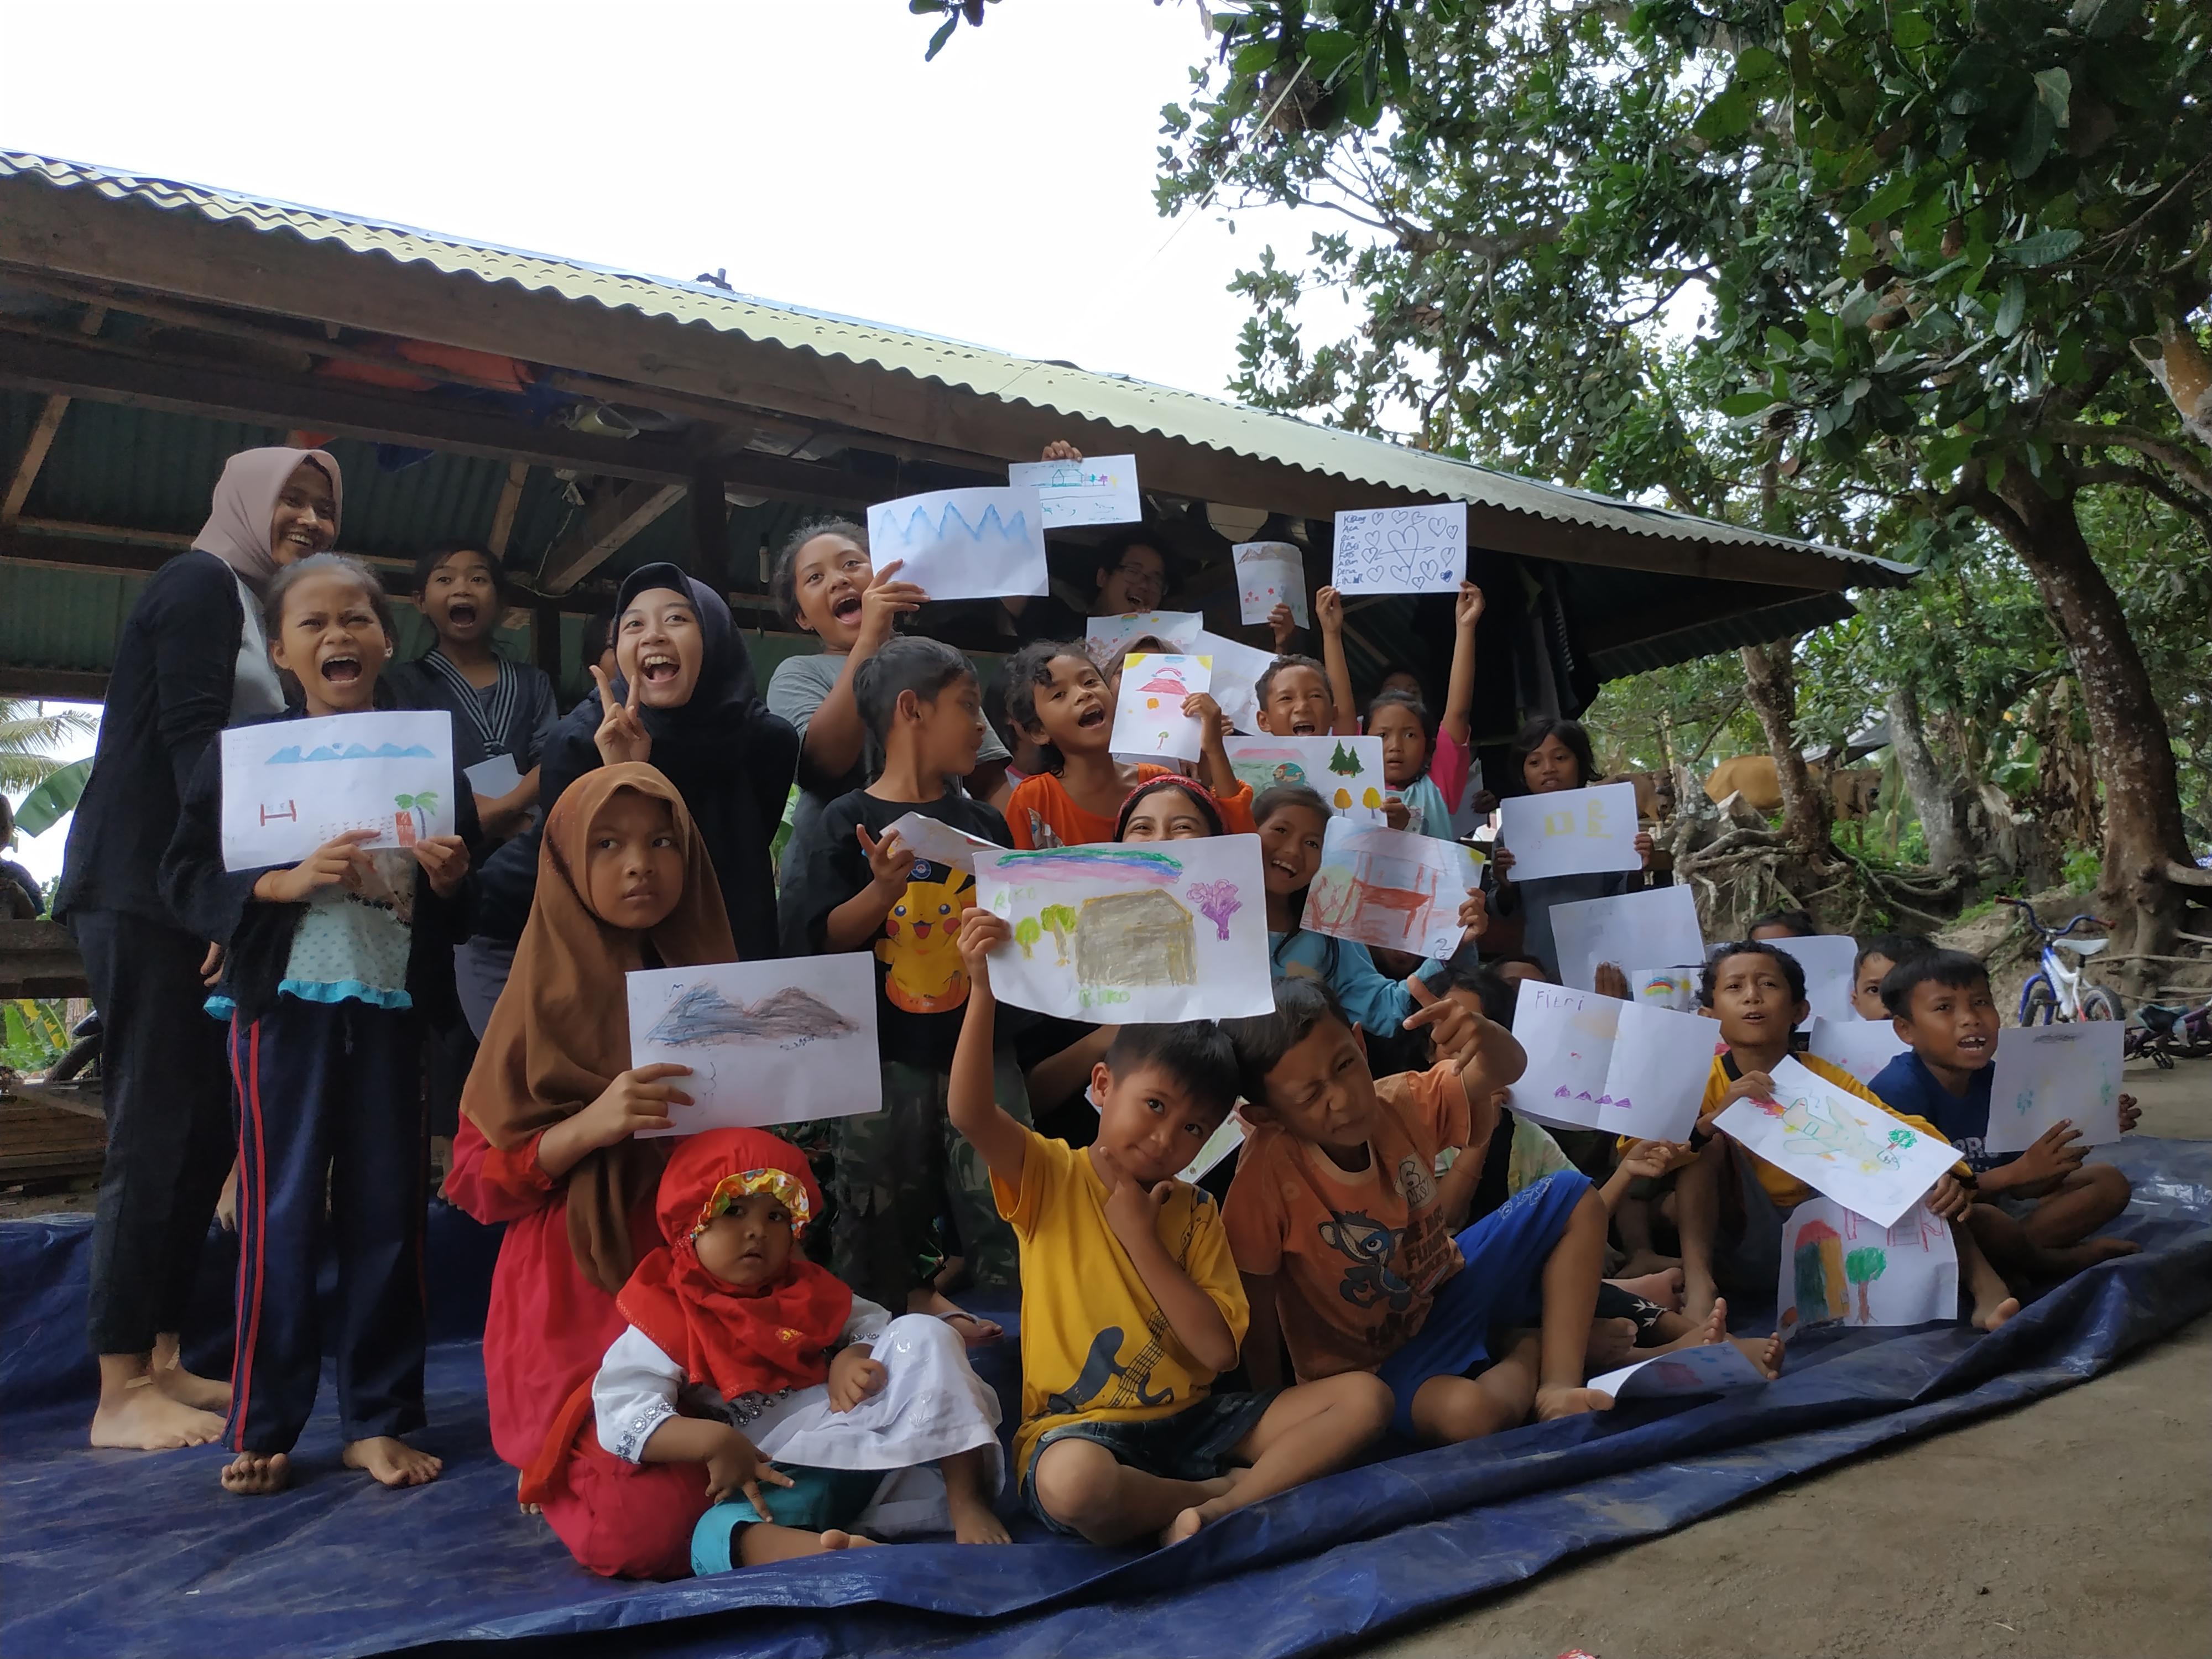 melalui-media-seni-tim-itb-kembalikan-senyum-anak-anak-pasca-gempa-di-lombok